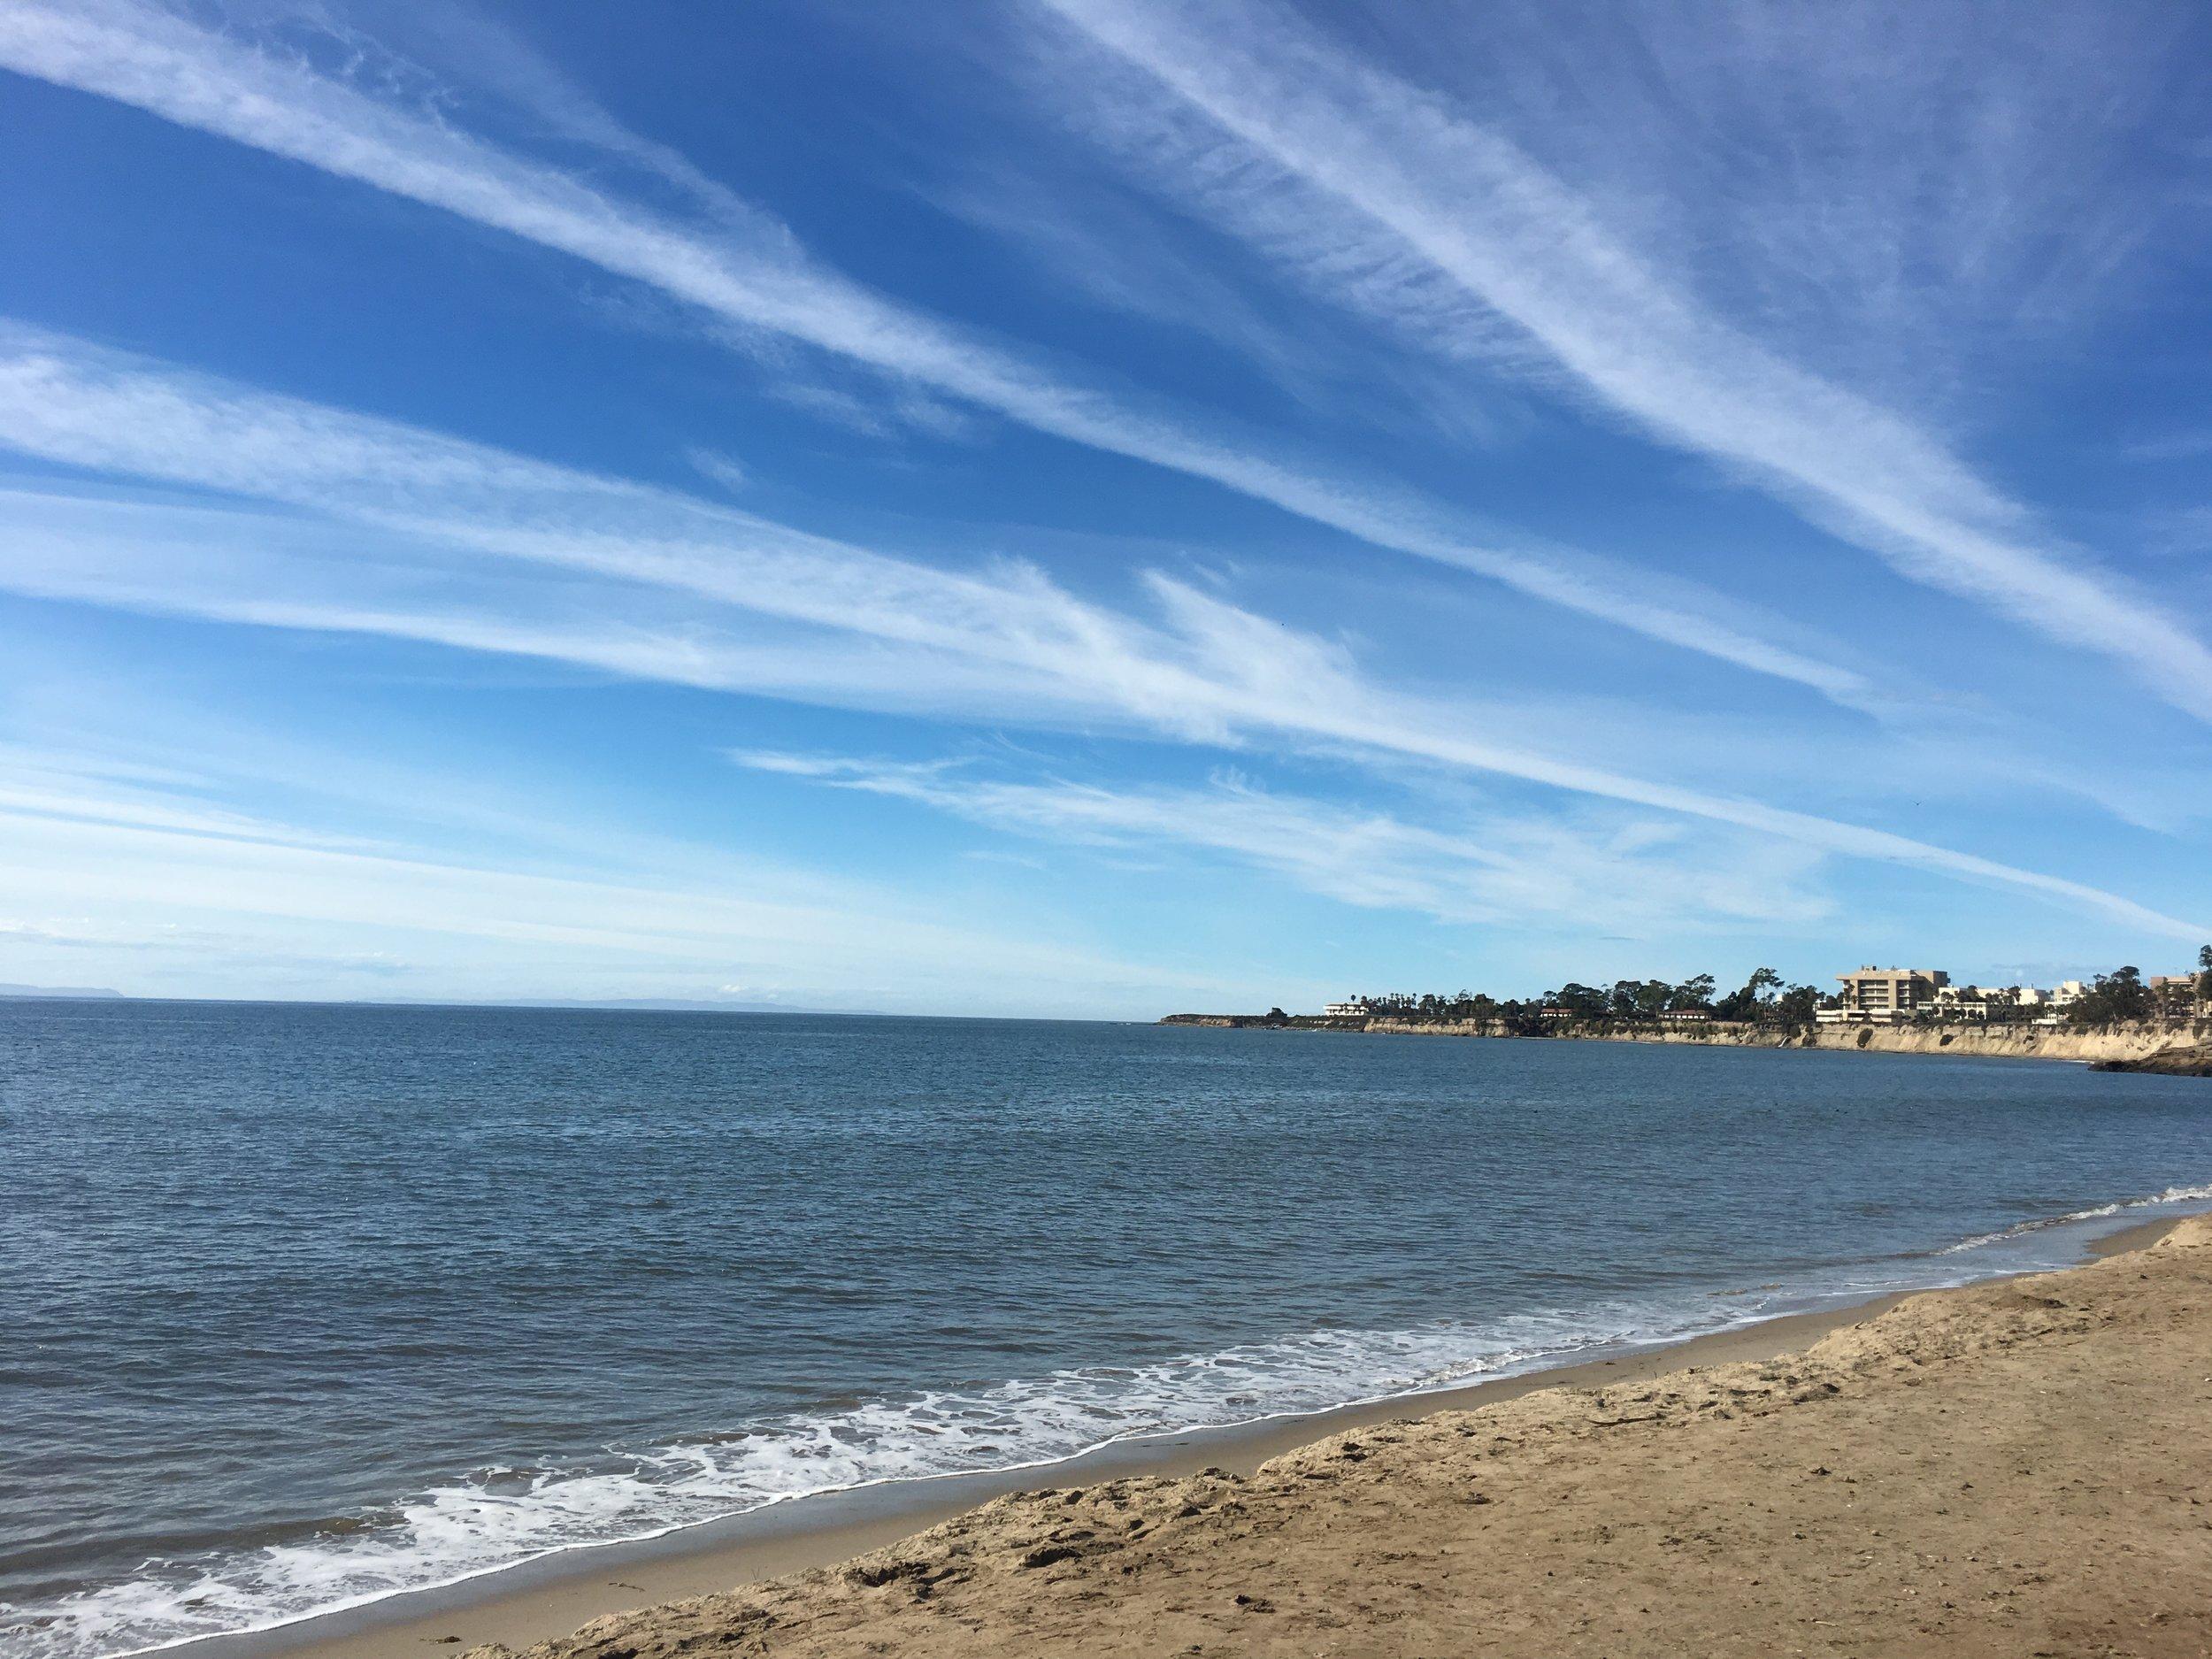 Beach in town looking out at University of California Santa Barbara.